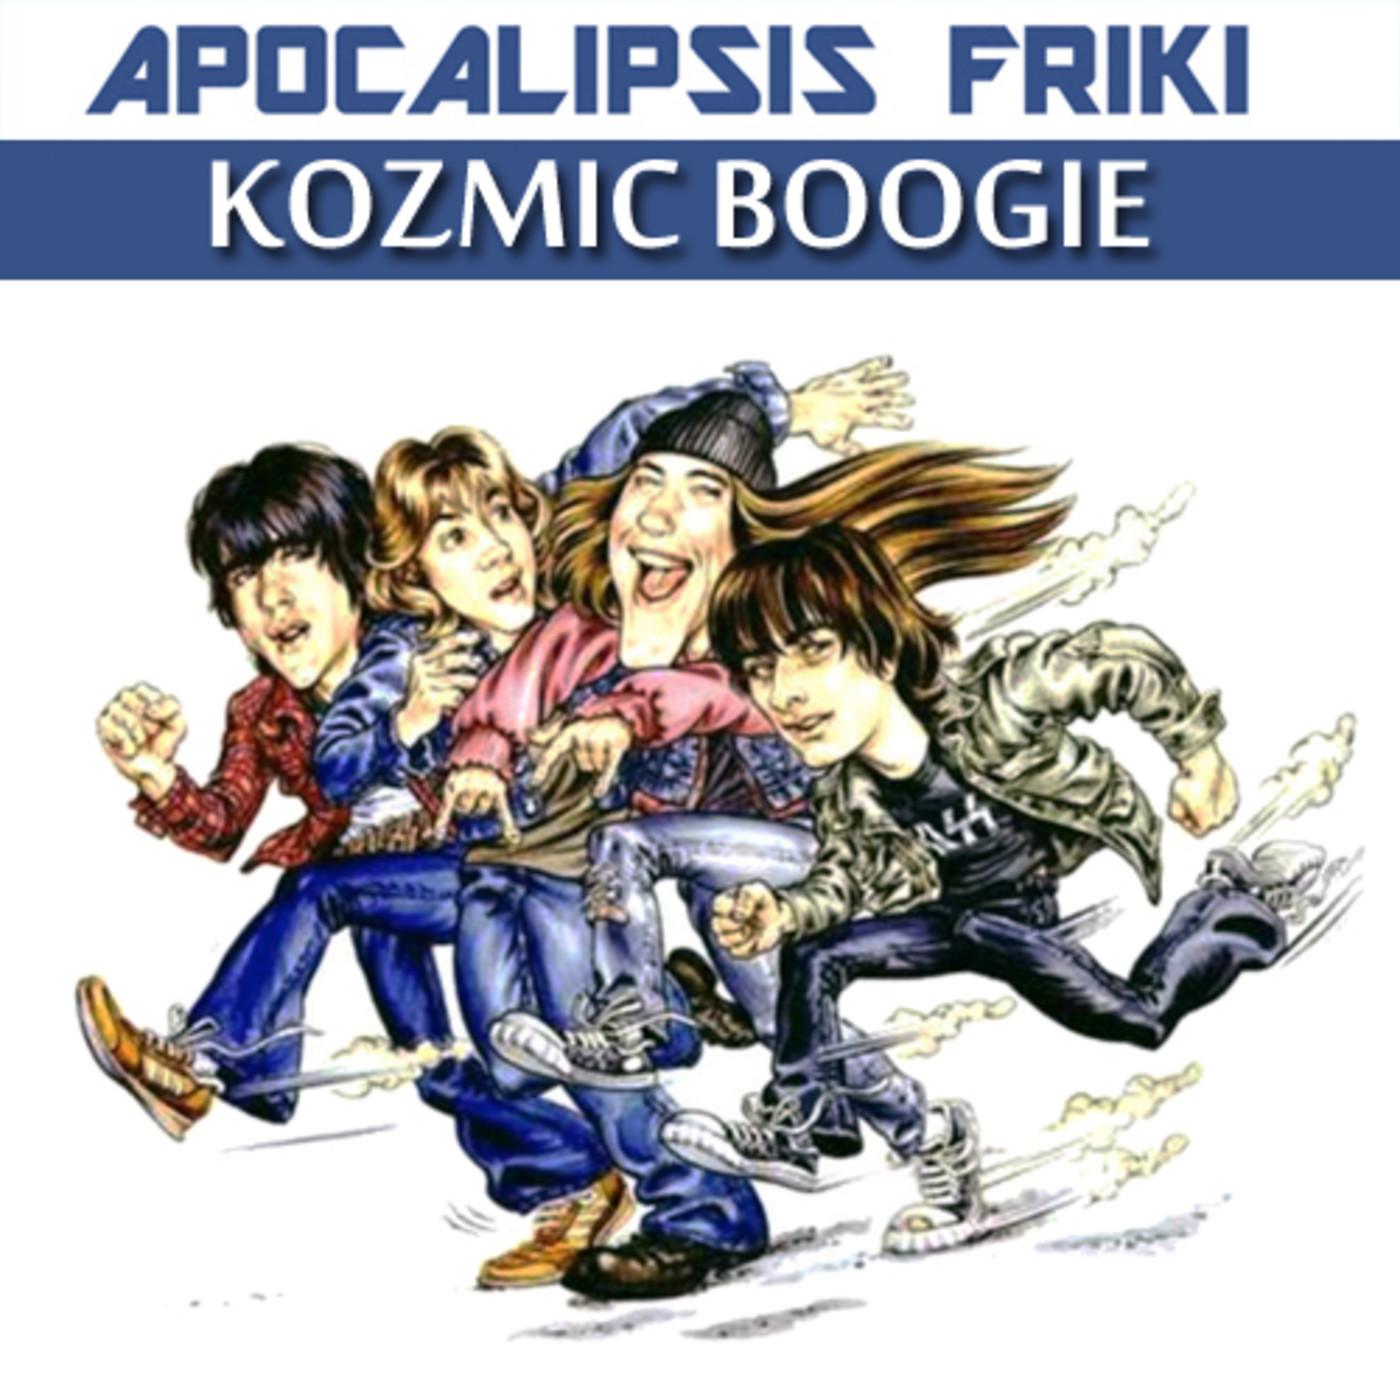 AF presenta: Kozmic Boogie 02 - Detroit Rock City / Cero en conducta